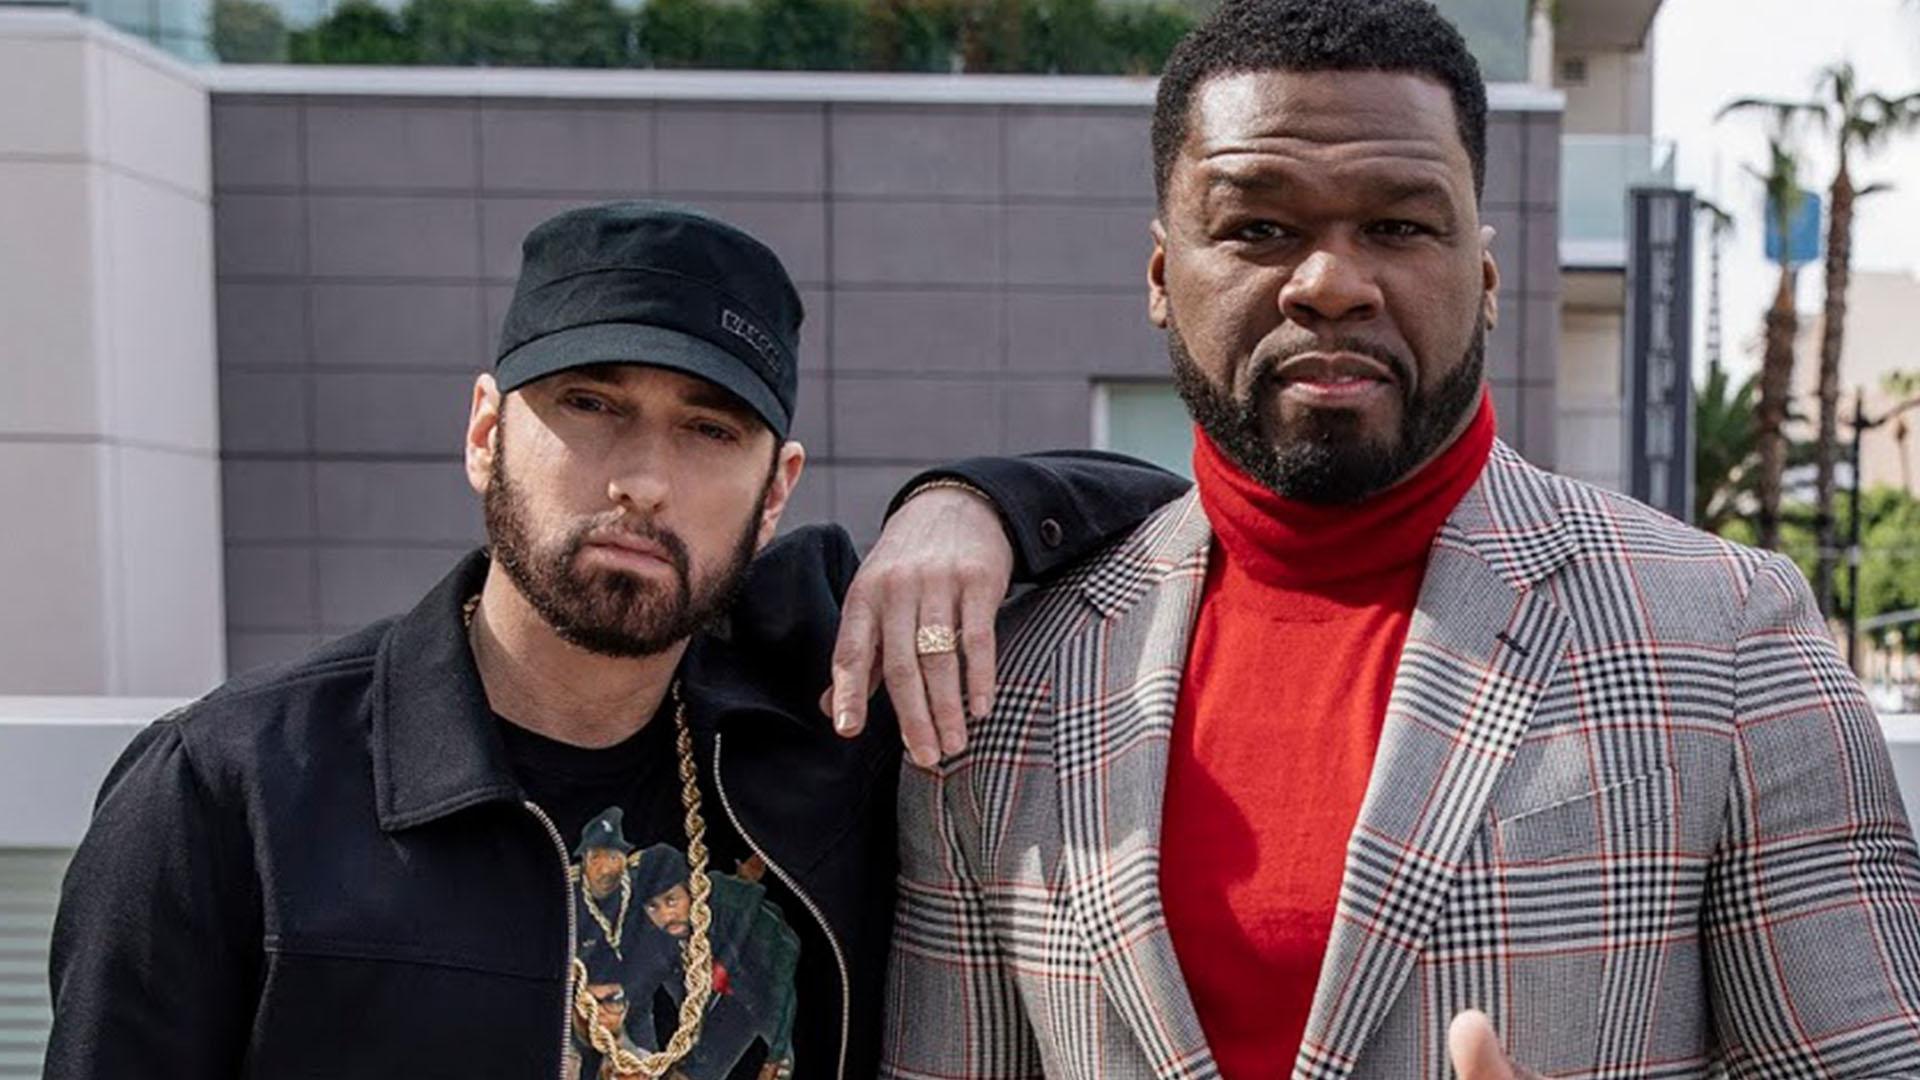 50 Cent Announces Eminem As Guest Star On His TV Show